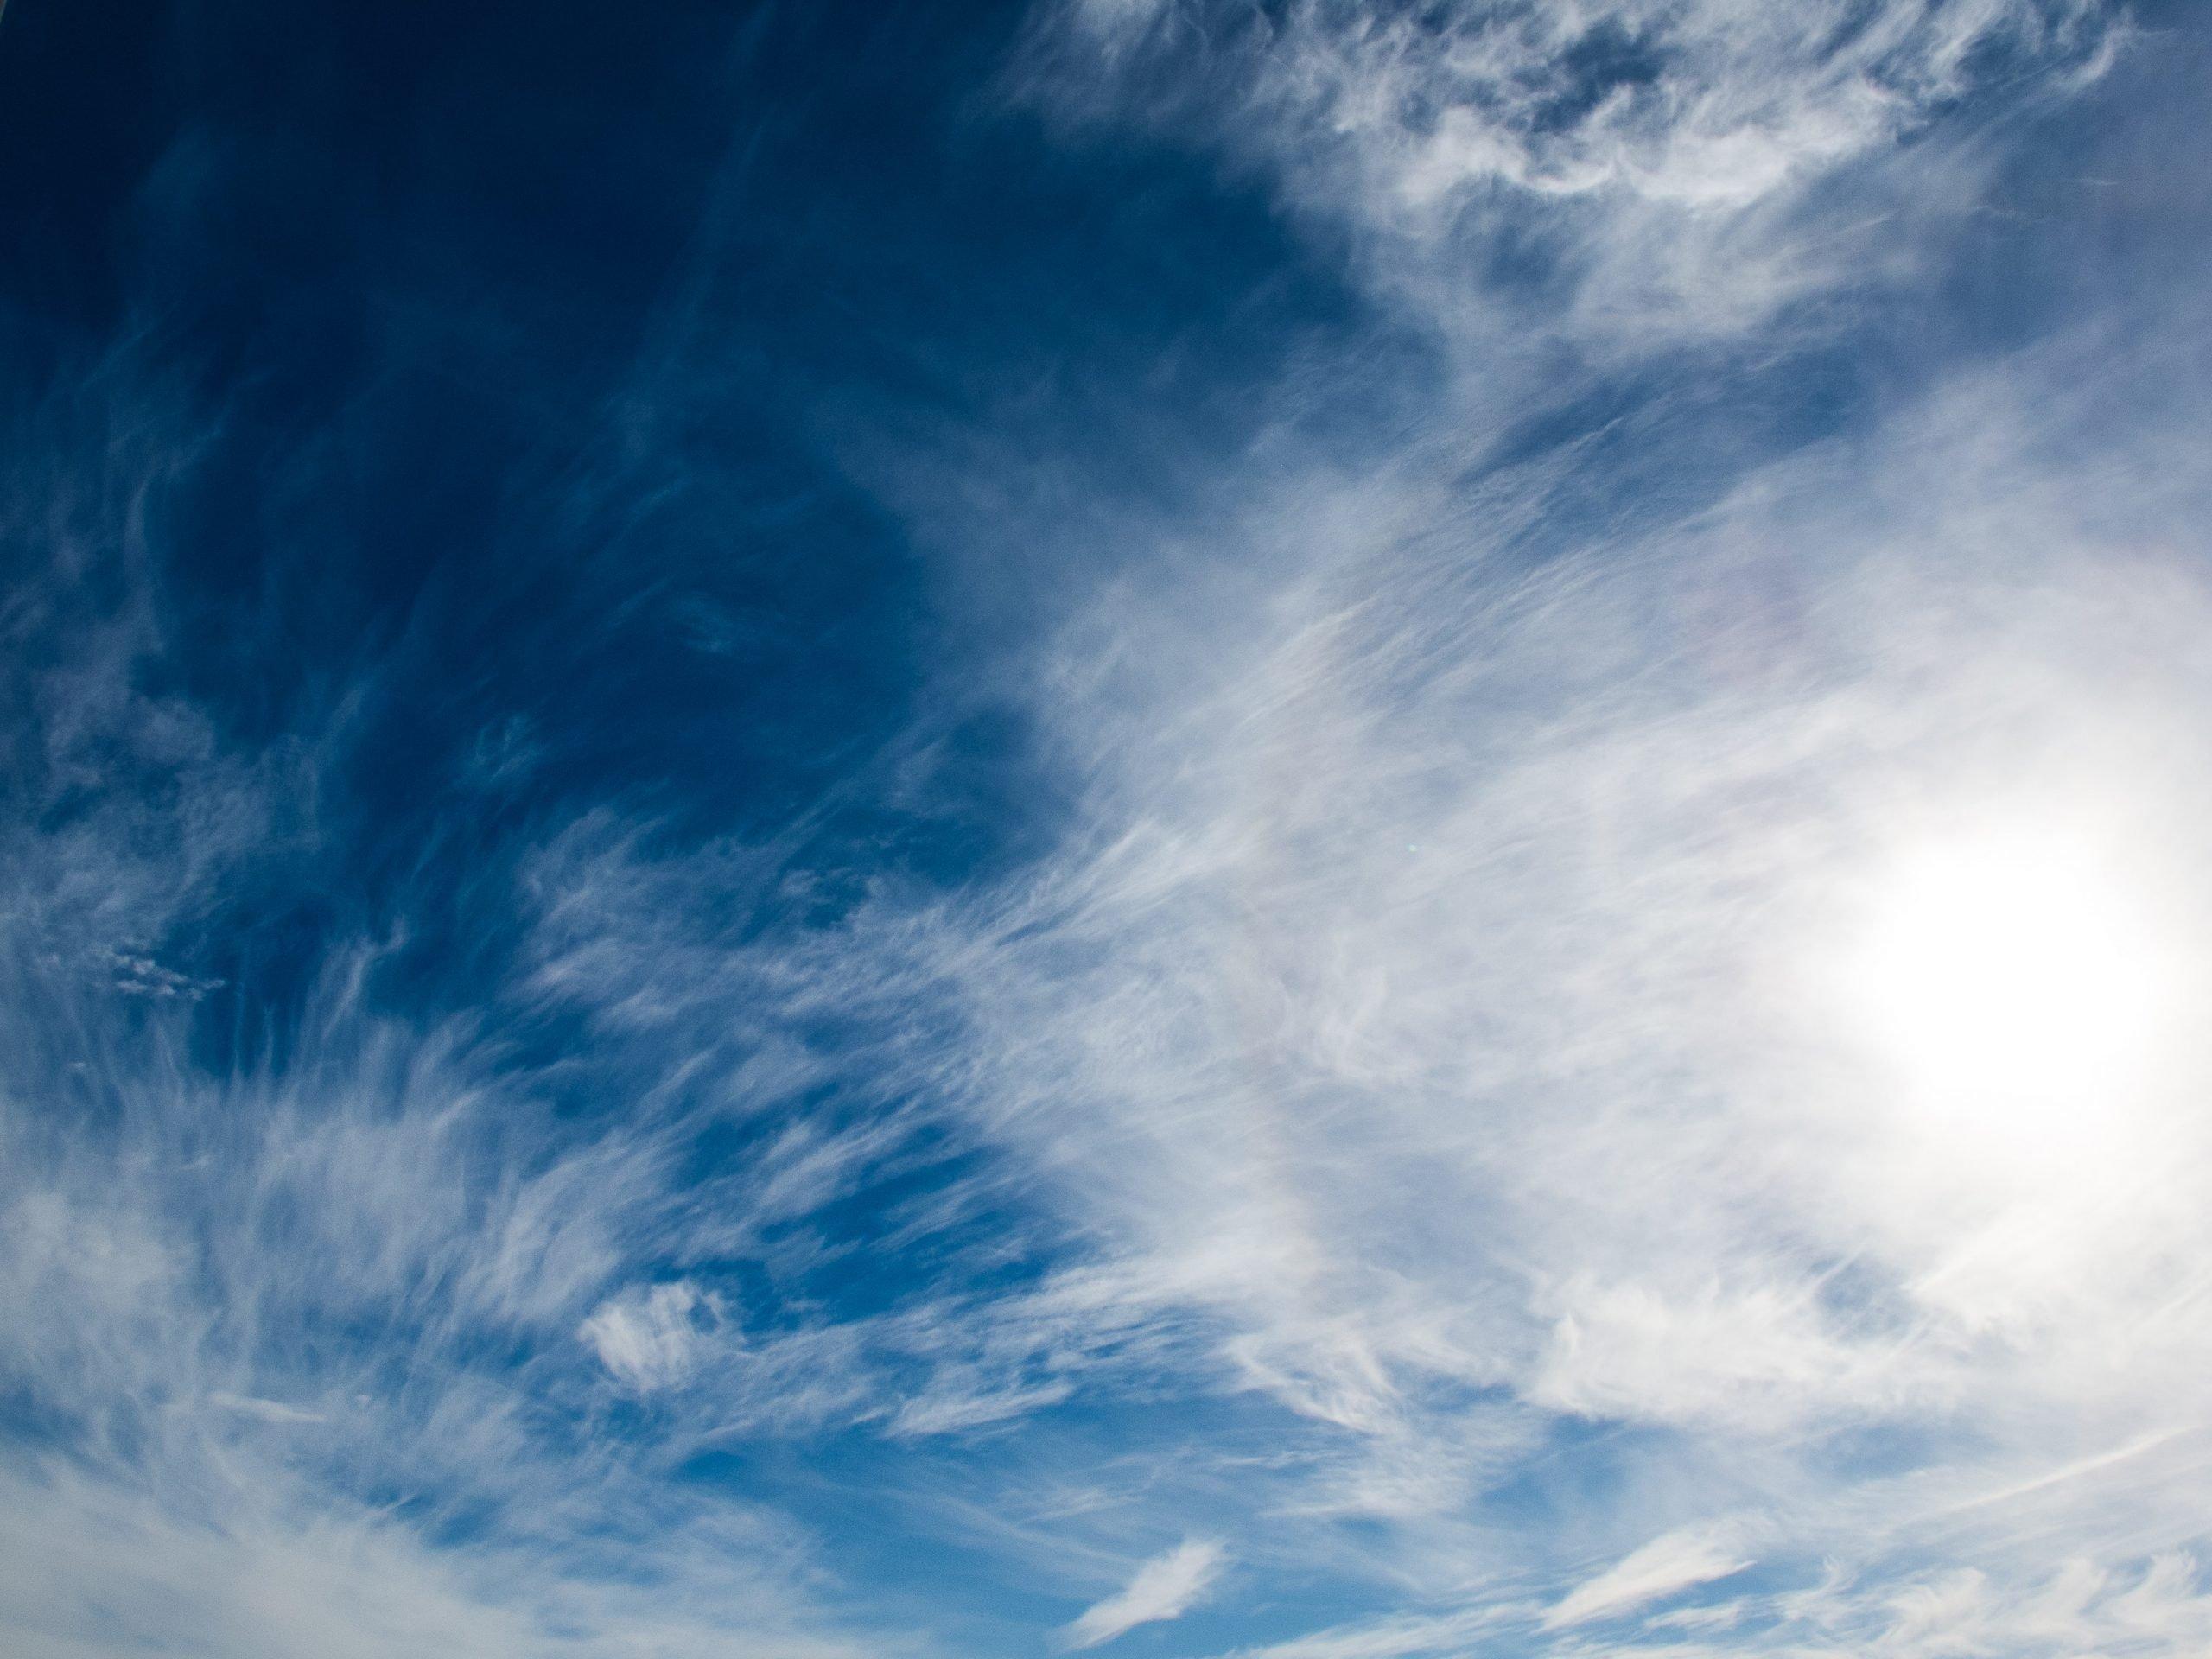 I am the infinite clear blue sky